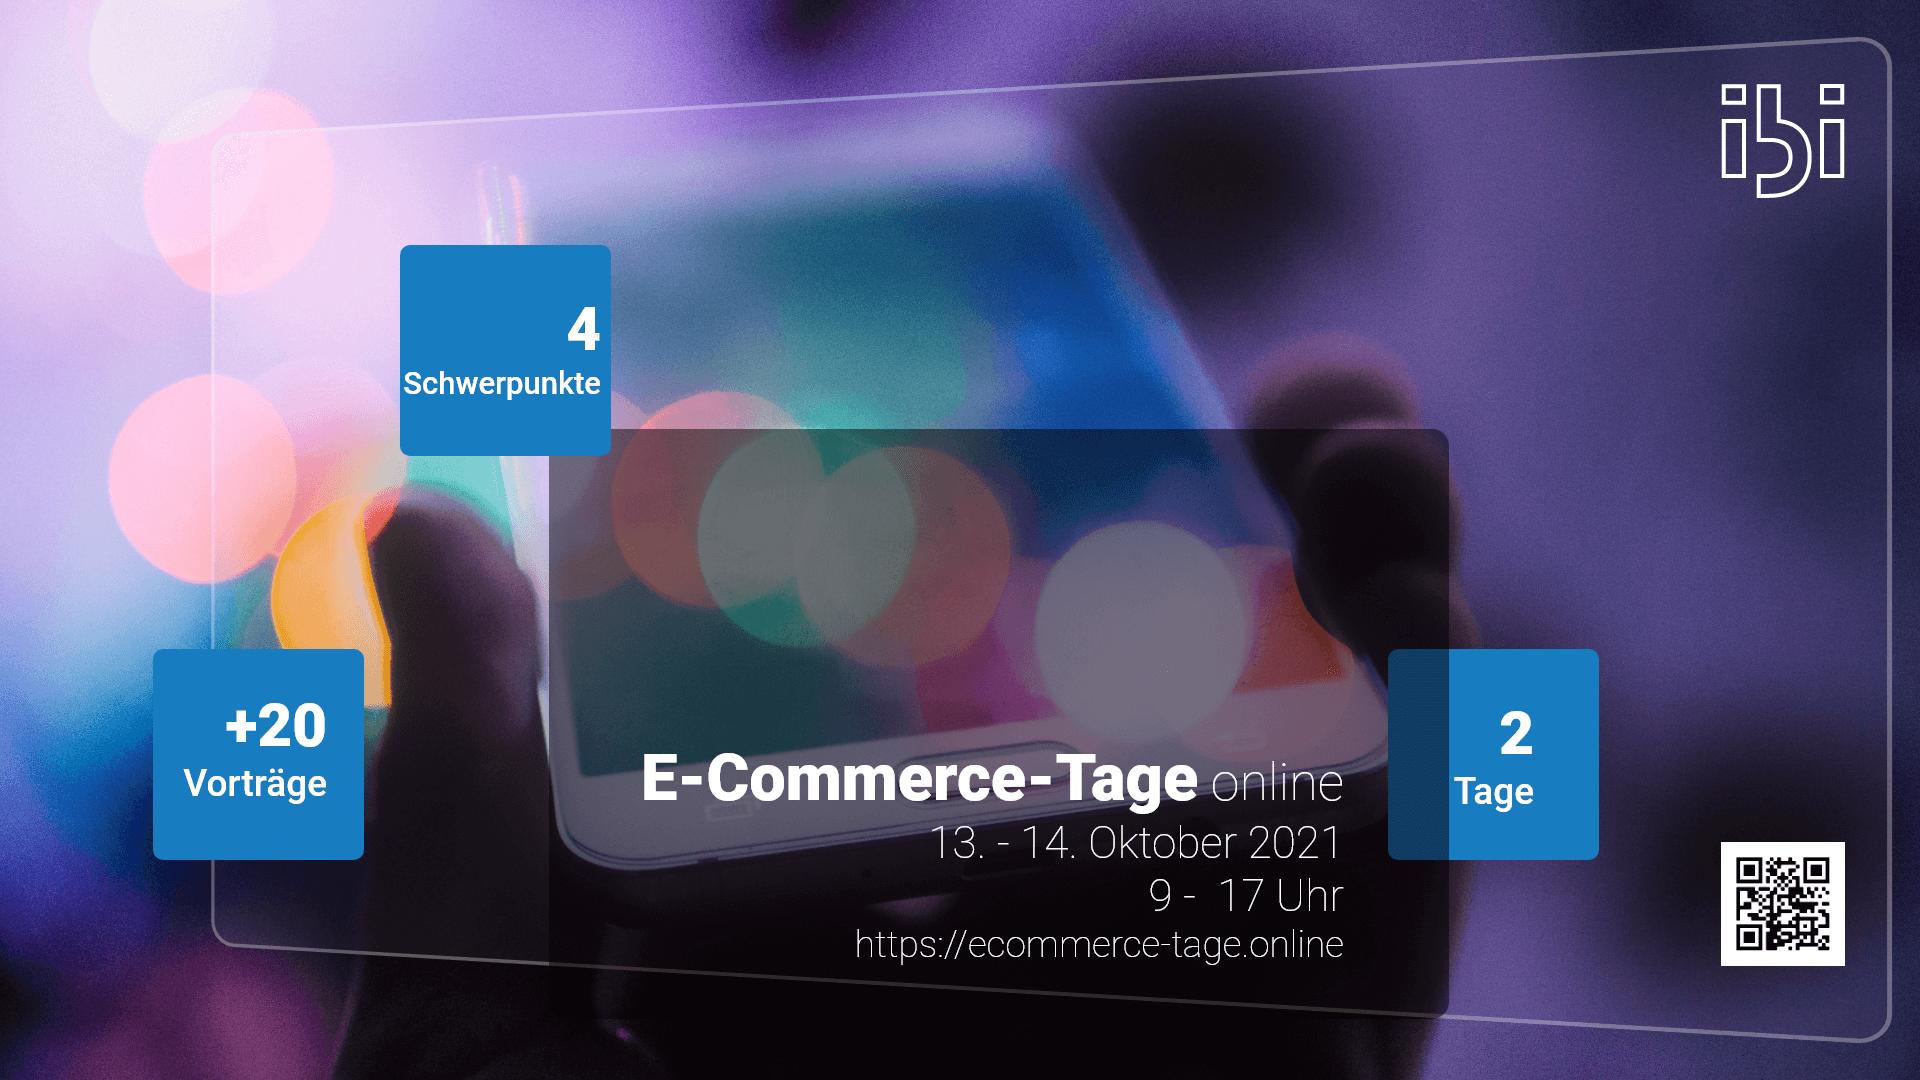 E-Commerce Tage online